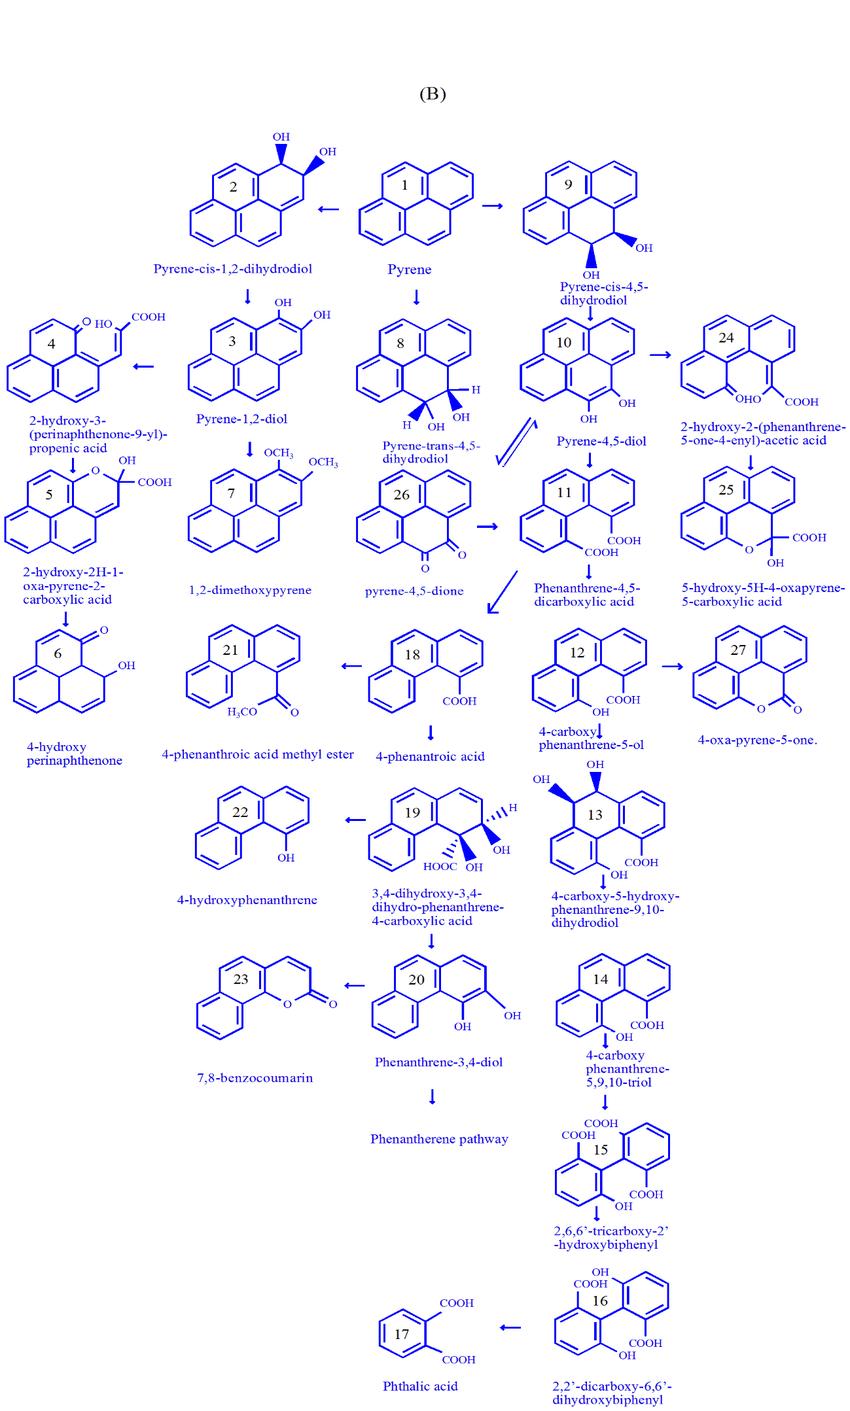 hight resolution of  a catabolism of phenanthrene using microorganism b catabolism of pyrene using microorganism